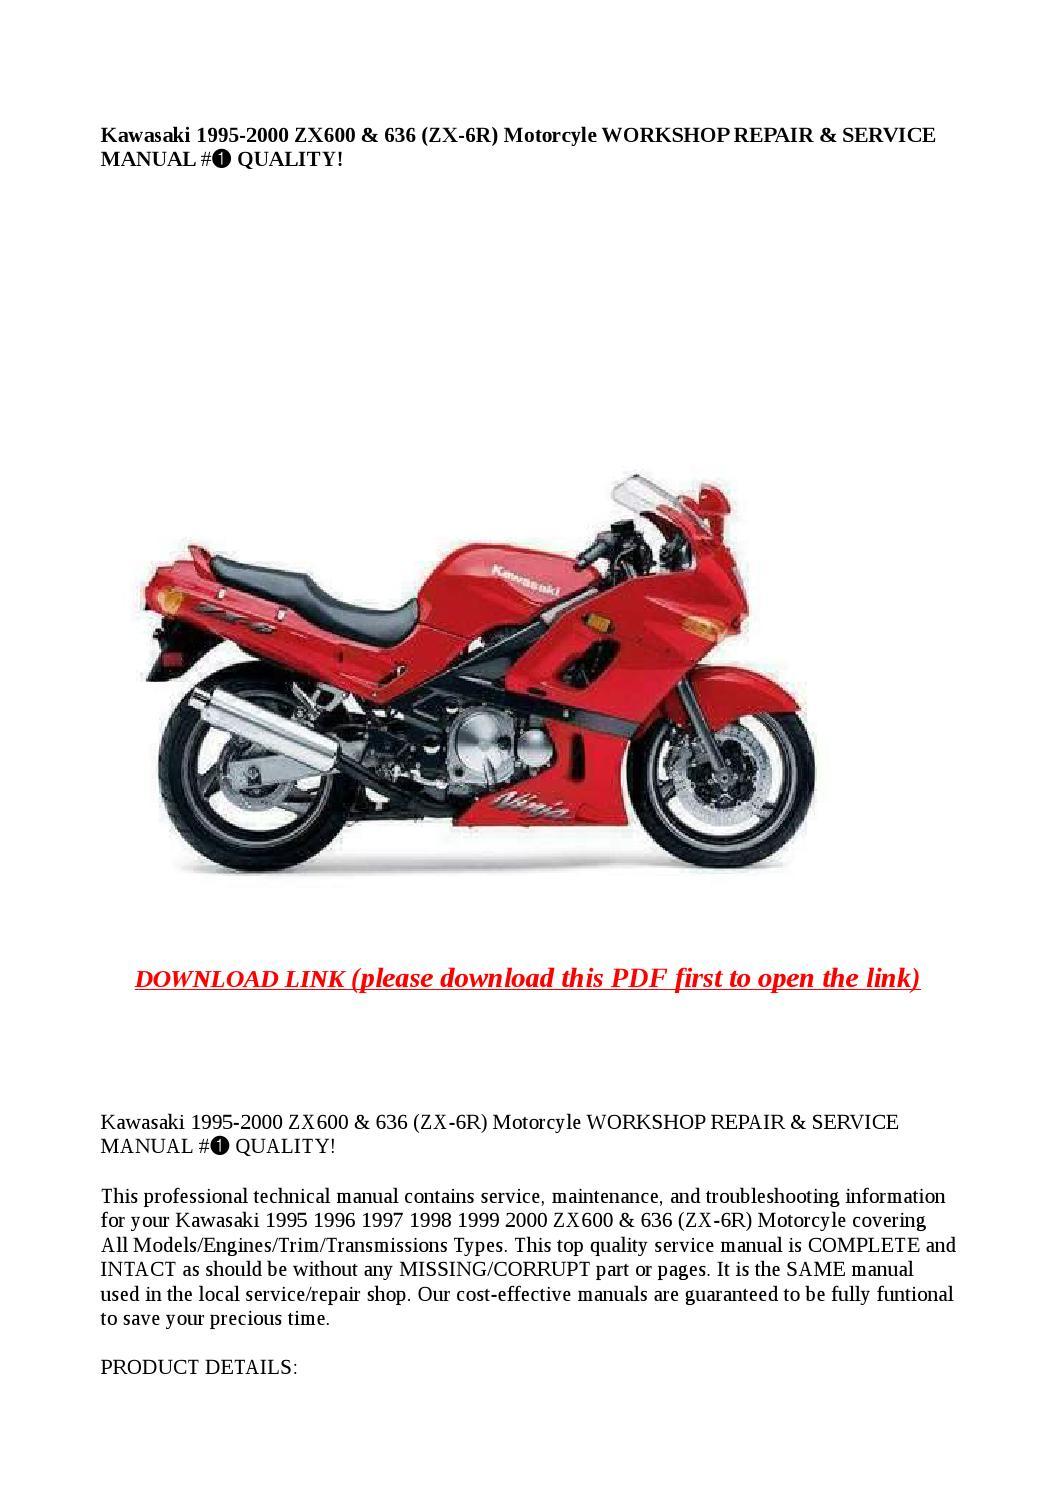 carbs GUARANTEED GOOD 1998-1999 Kawasaki ZX6r ZX-600G Carburetor